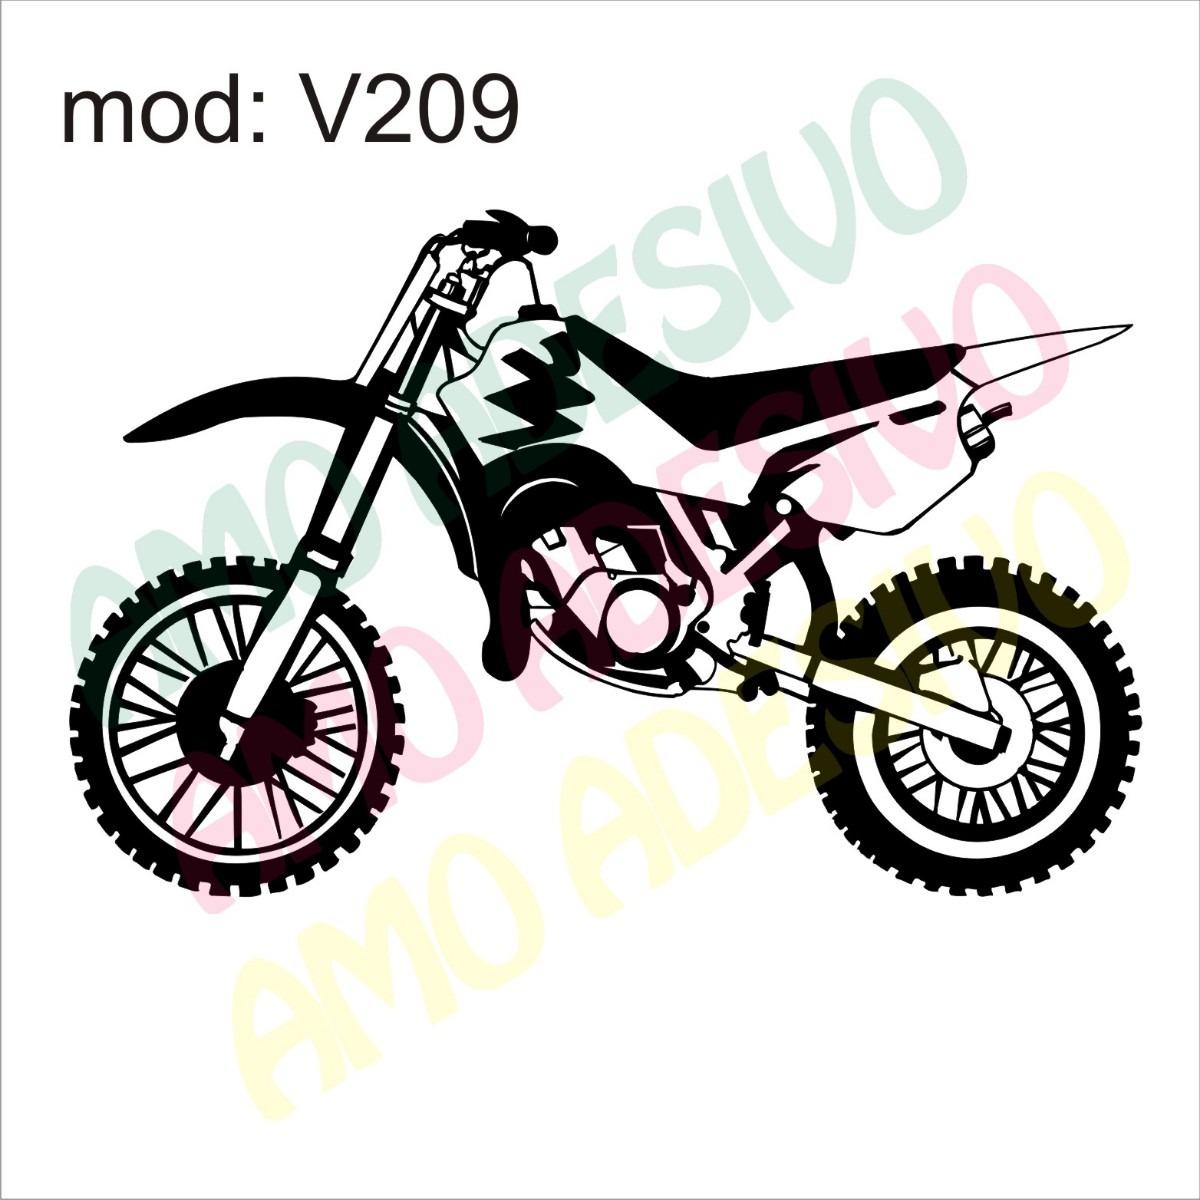 Adesivo V209 Moto Xt Desenho Abstrato Decorativo De Parede R 87